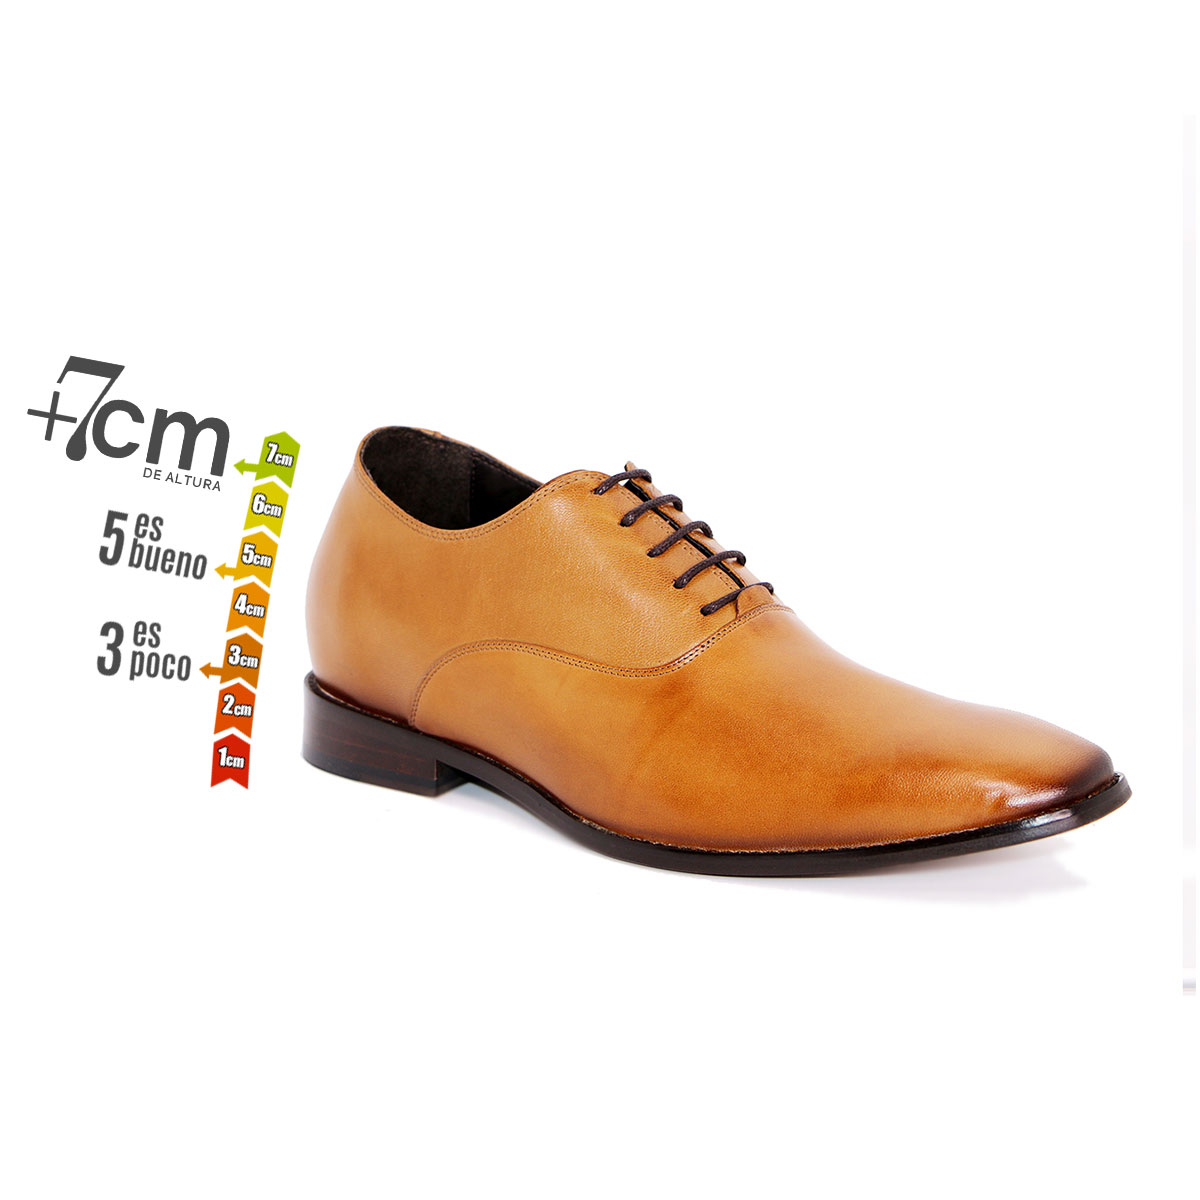 Zapato Formal Elegant Café Claro Max Denegri +7cm de Altura_74149